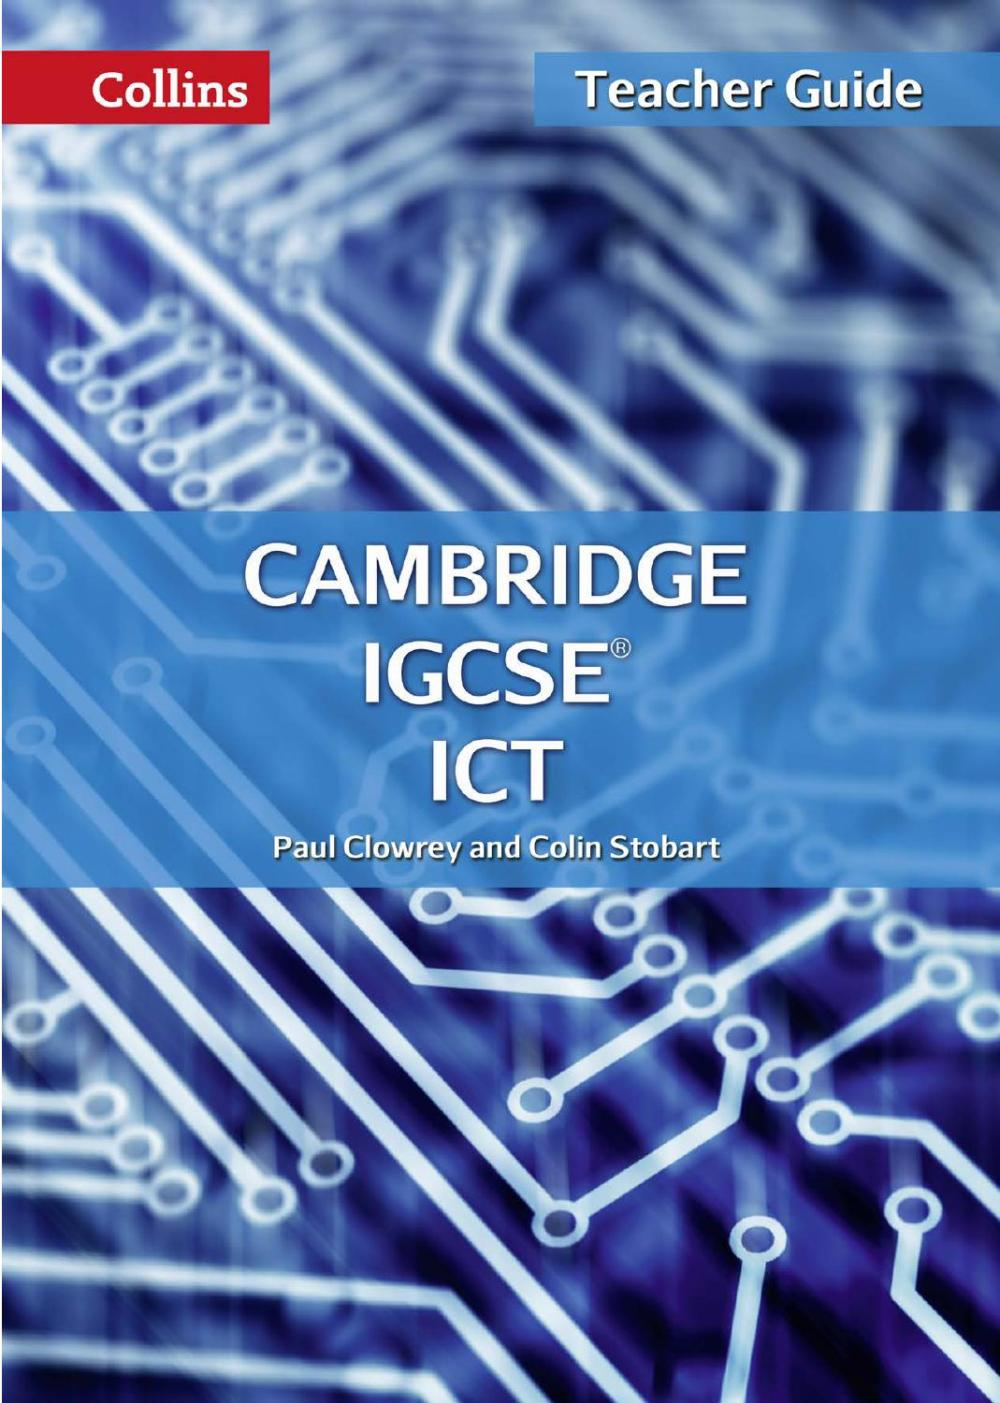 medium resolution of Cambridge IGCSE ICT Teacher Guide by Collins - issuu